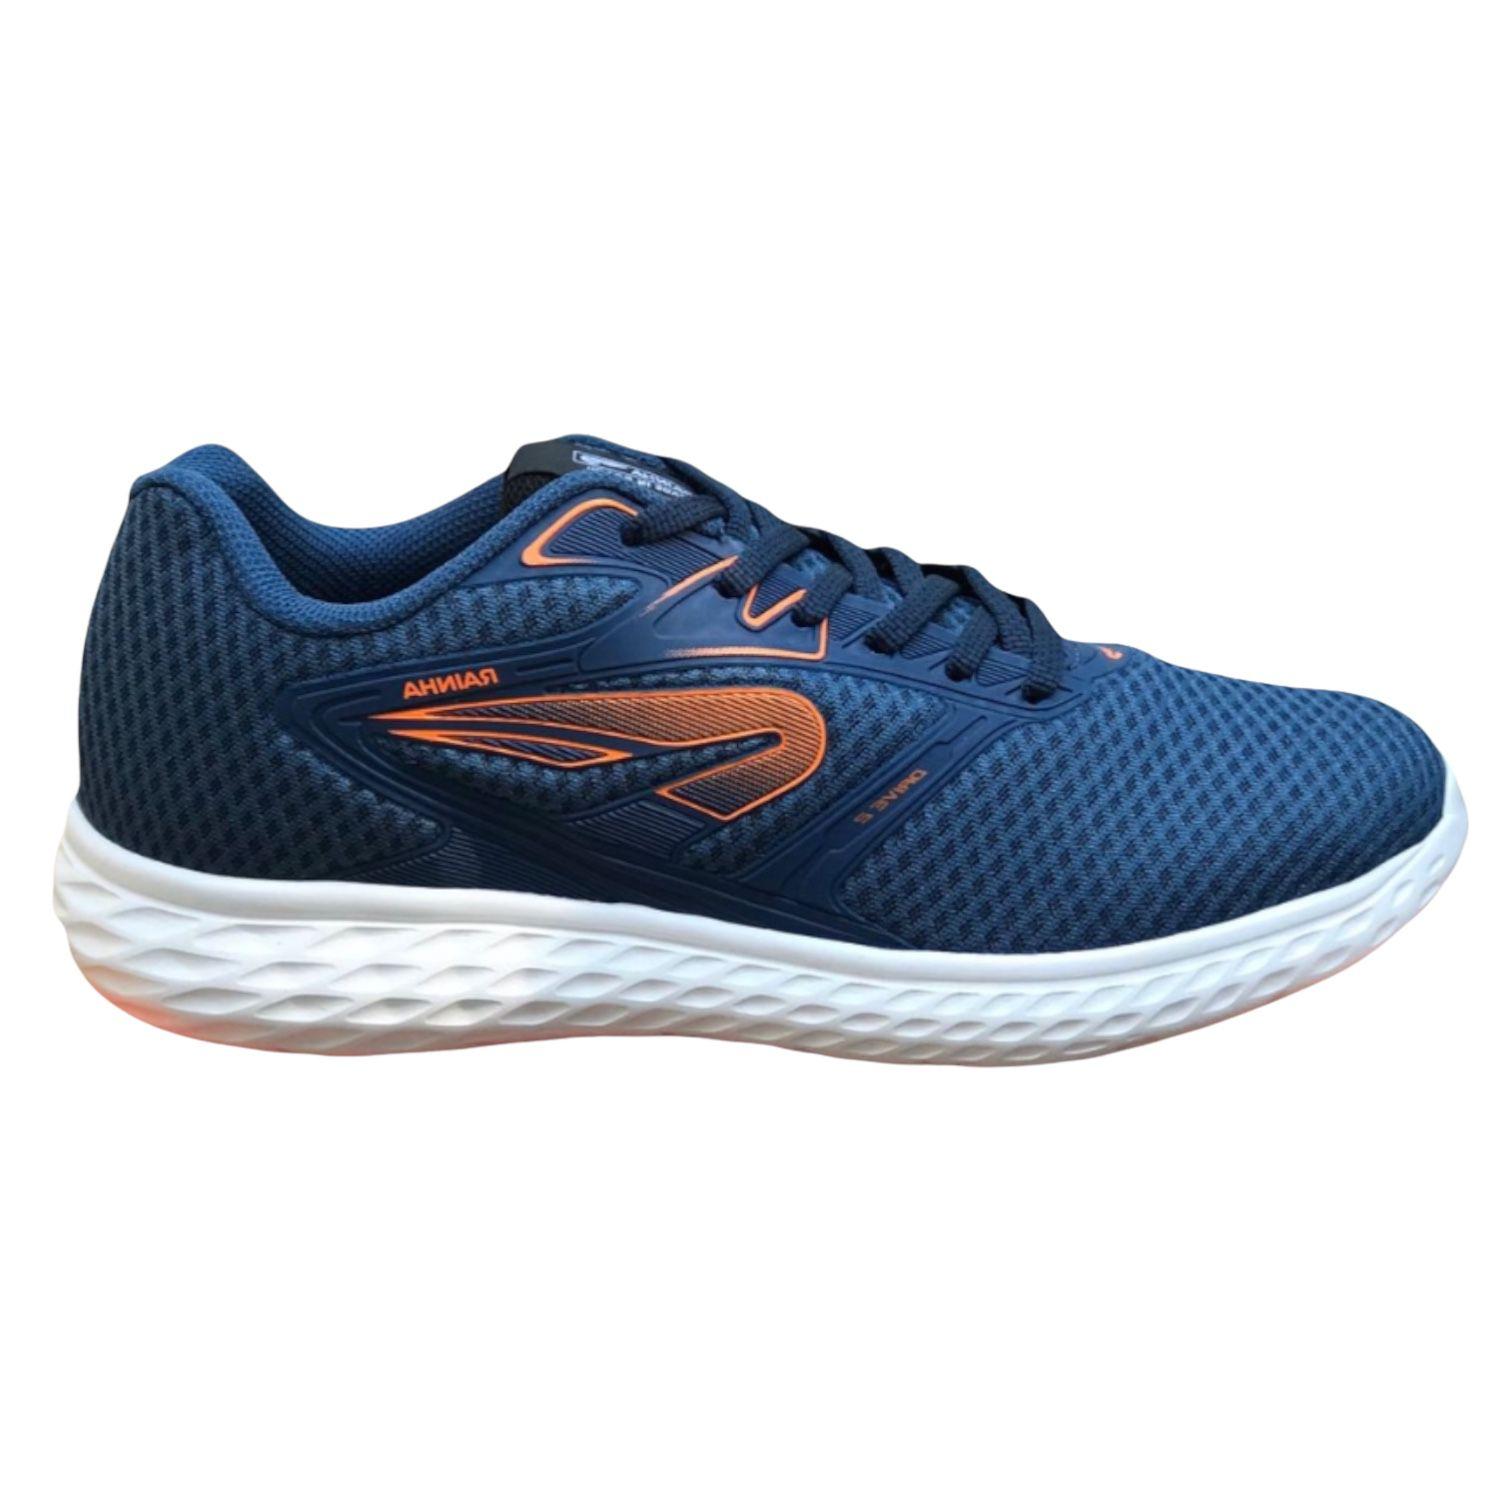 Tênis Esportivo Rainha Drive II Azul